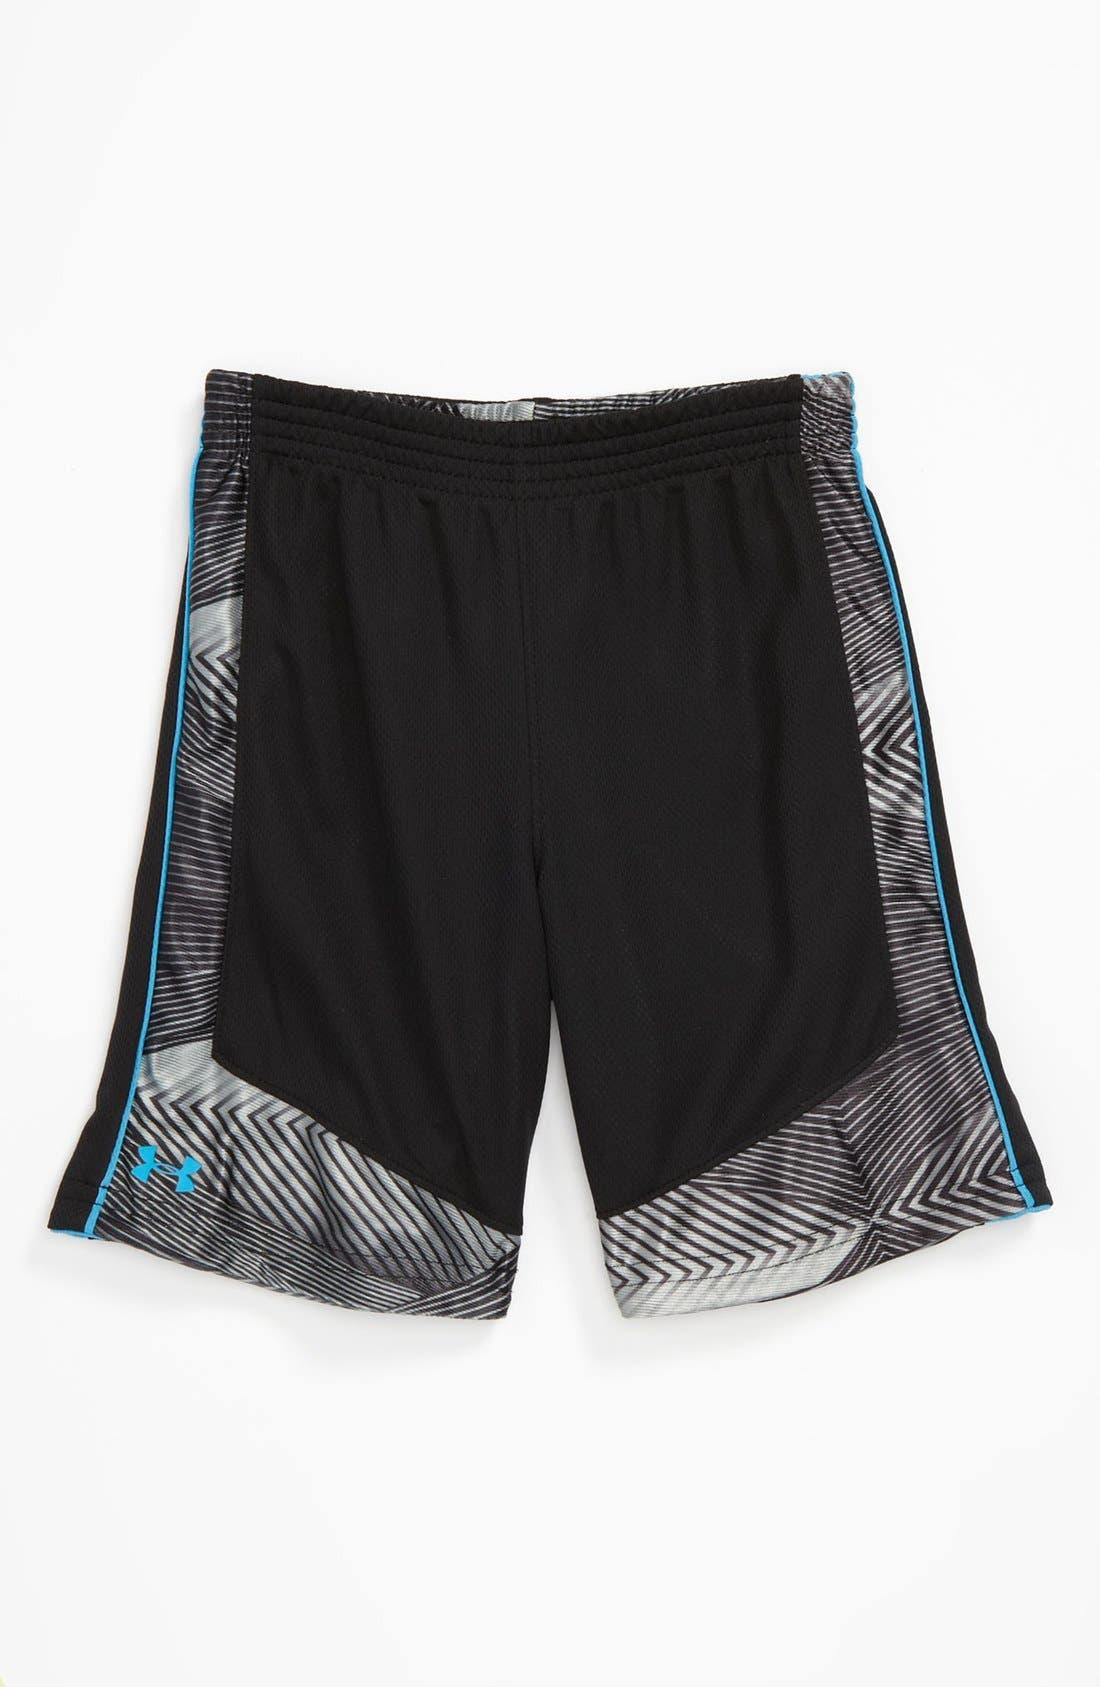 Alternate Image 1 Selected - Under Armour HeatGear® Reversible Shorts (Toddler)